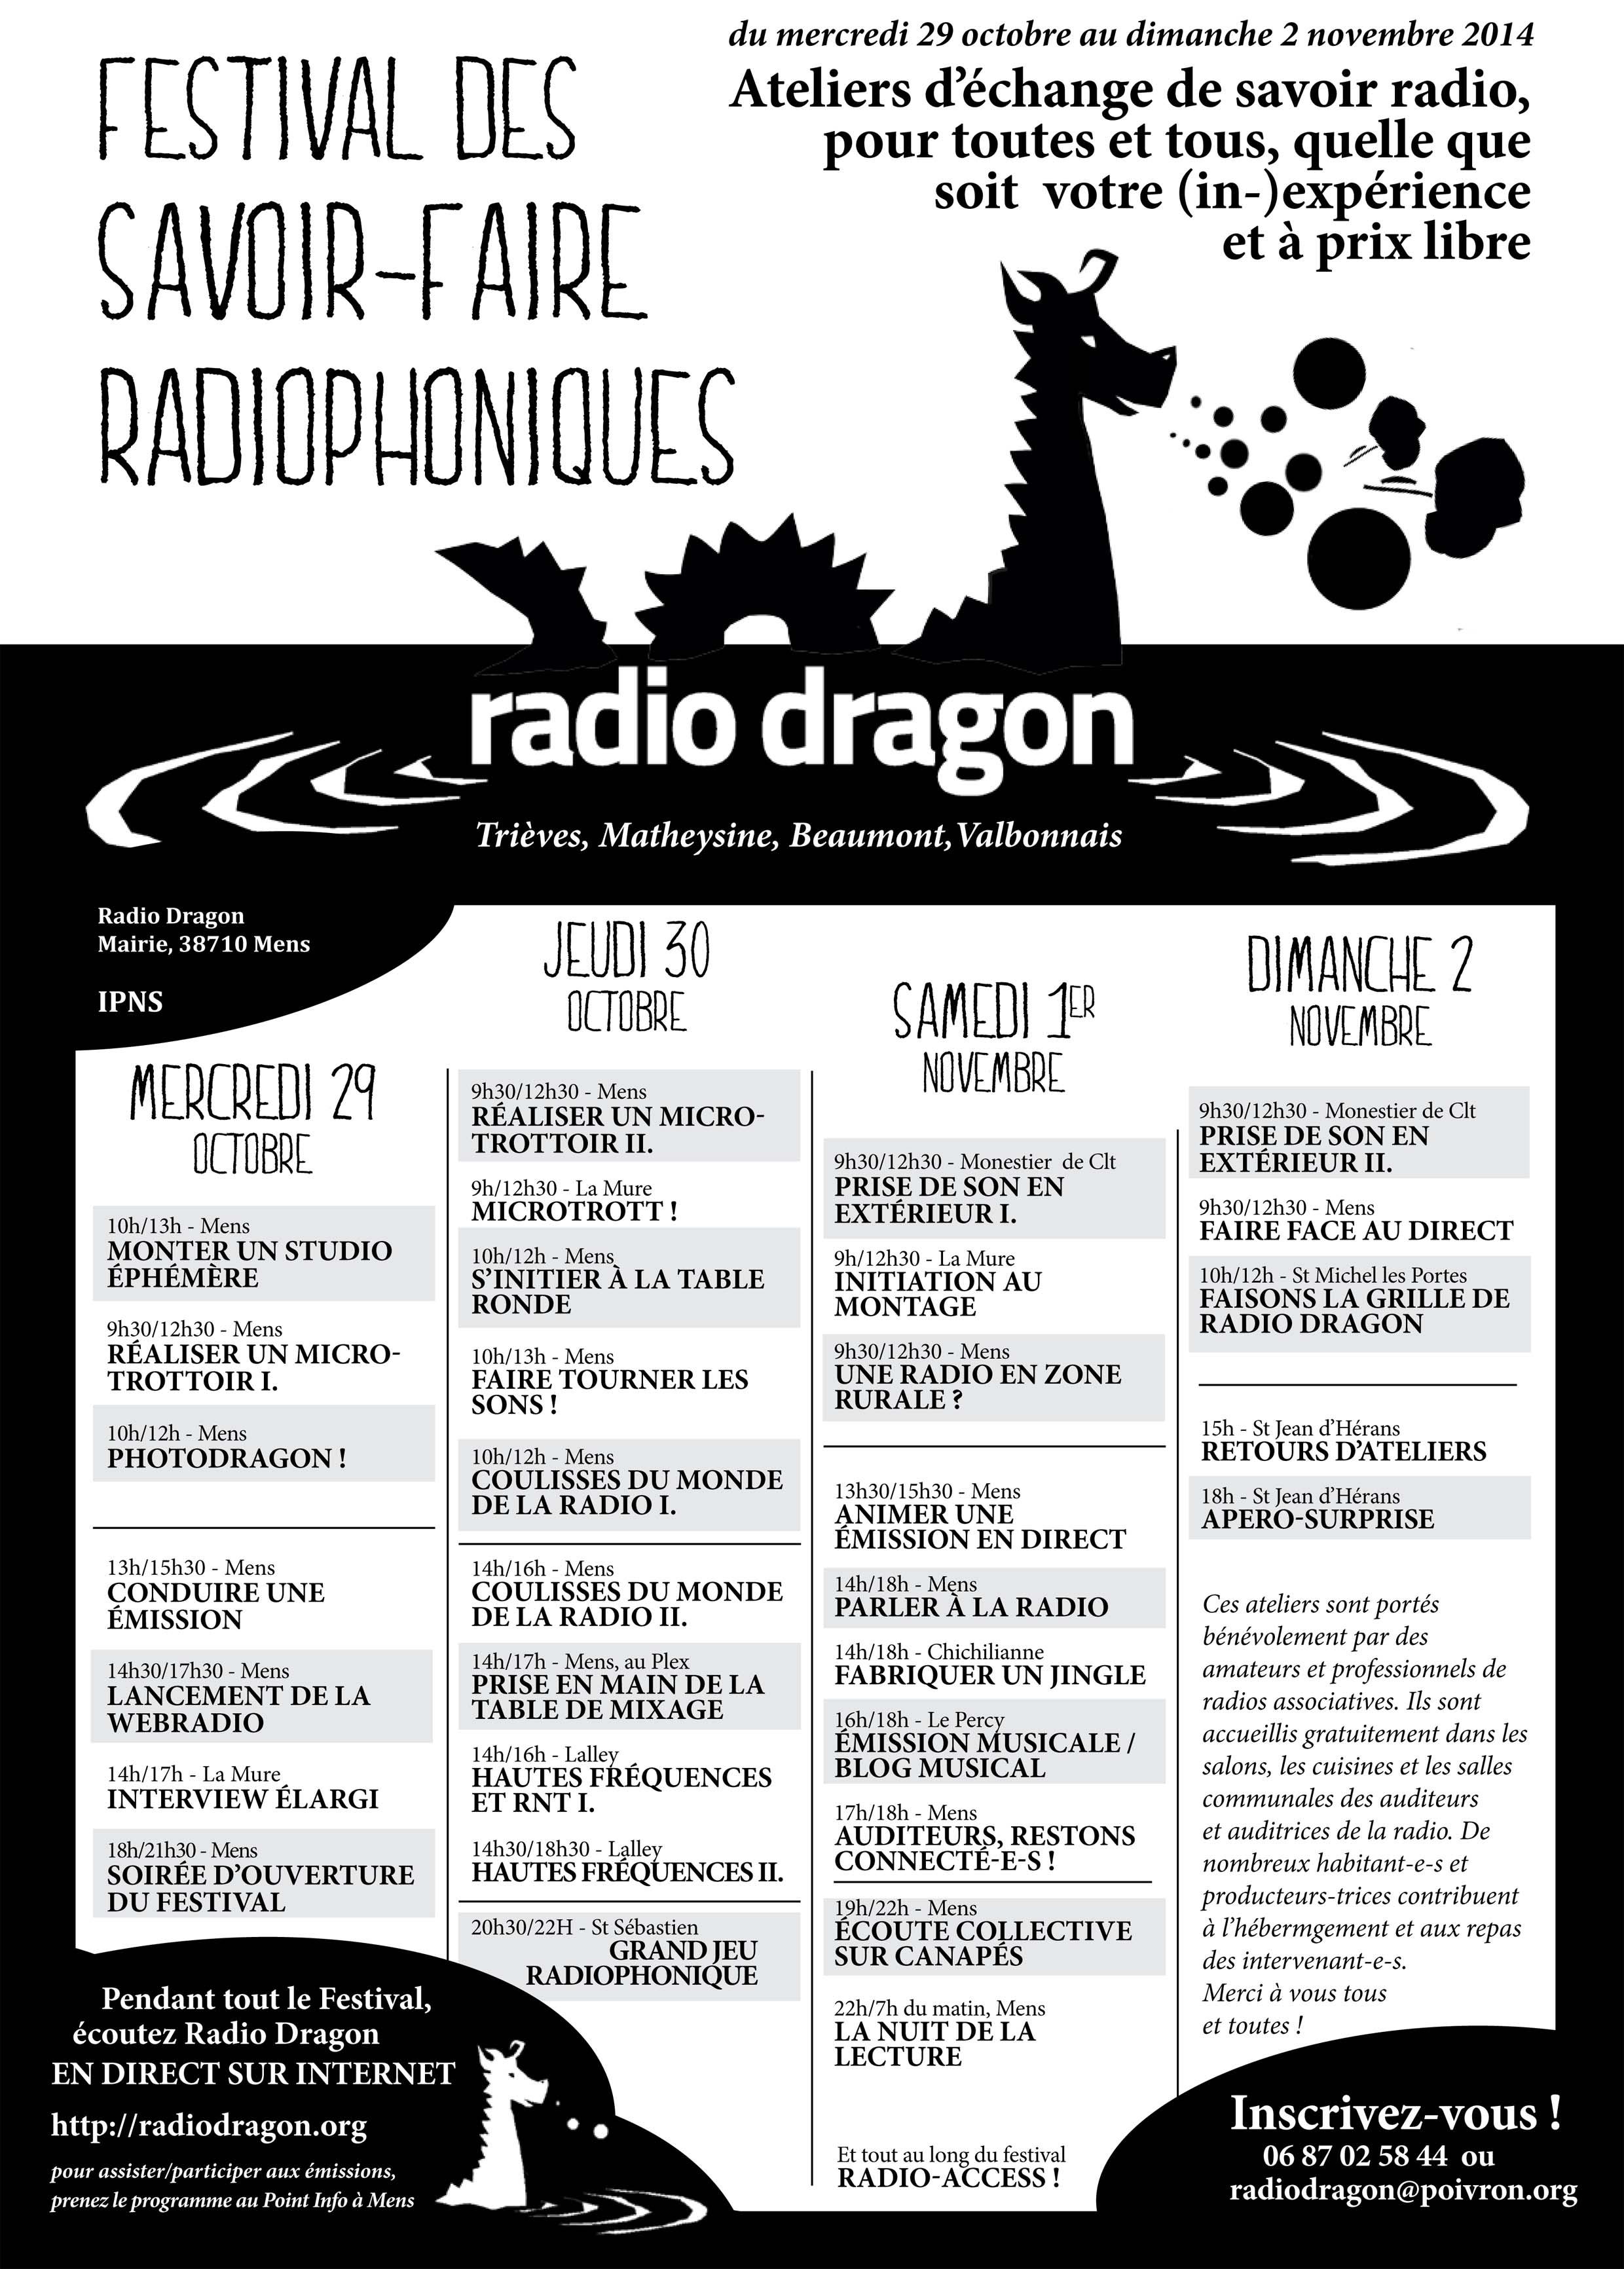 2014-10-11-ateliers-radio-affiche